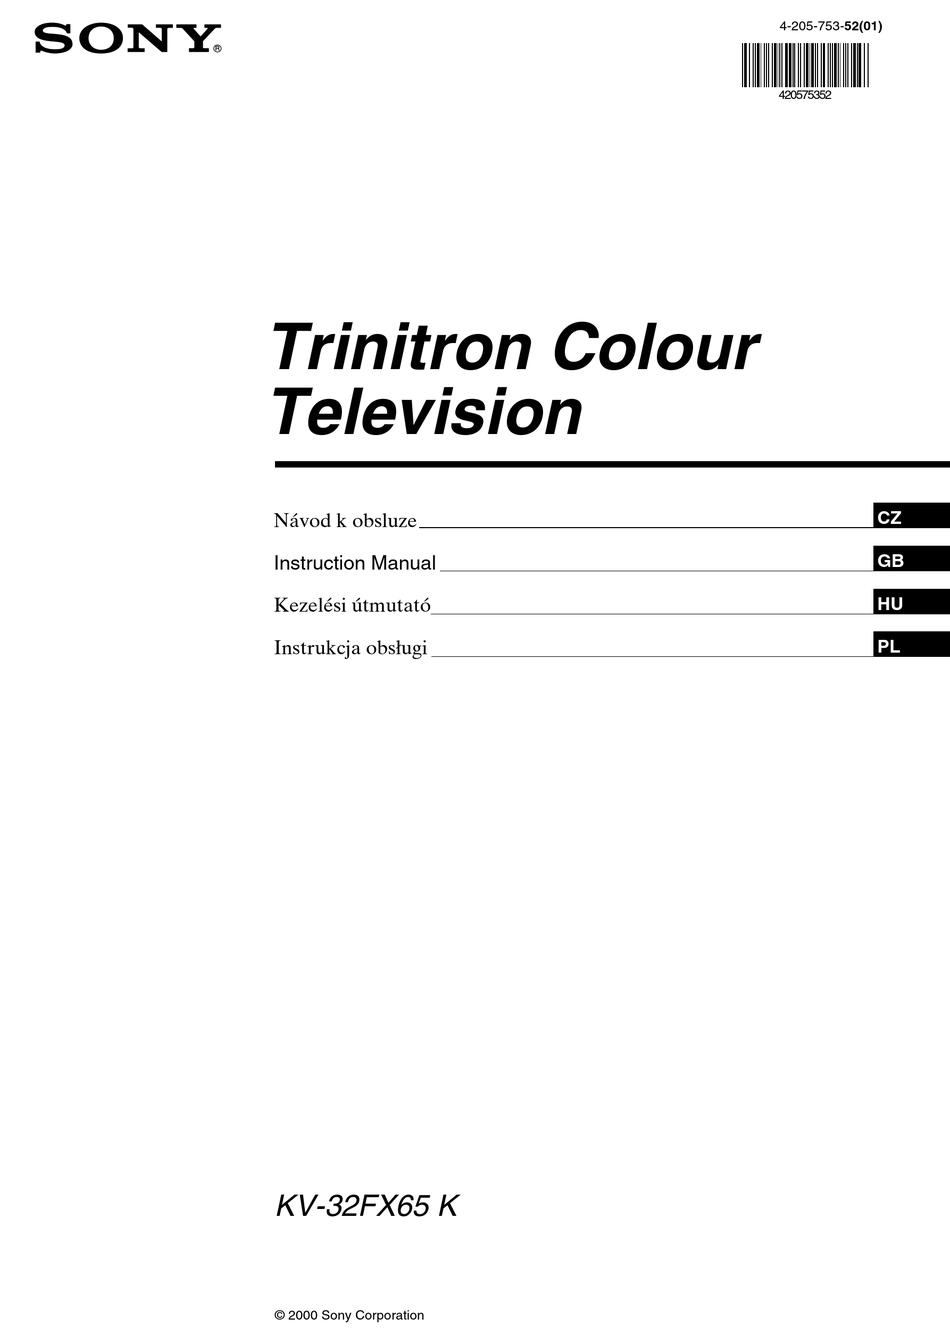 Sony Fd Trinitron Kv 32fx65 K Instruction Manual Pdf Download Manualslib